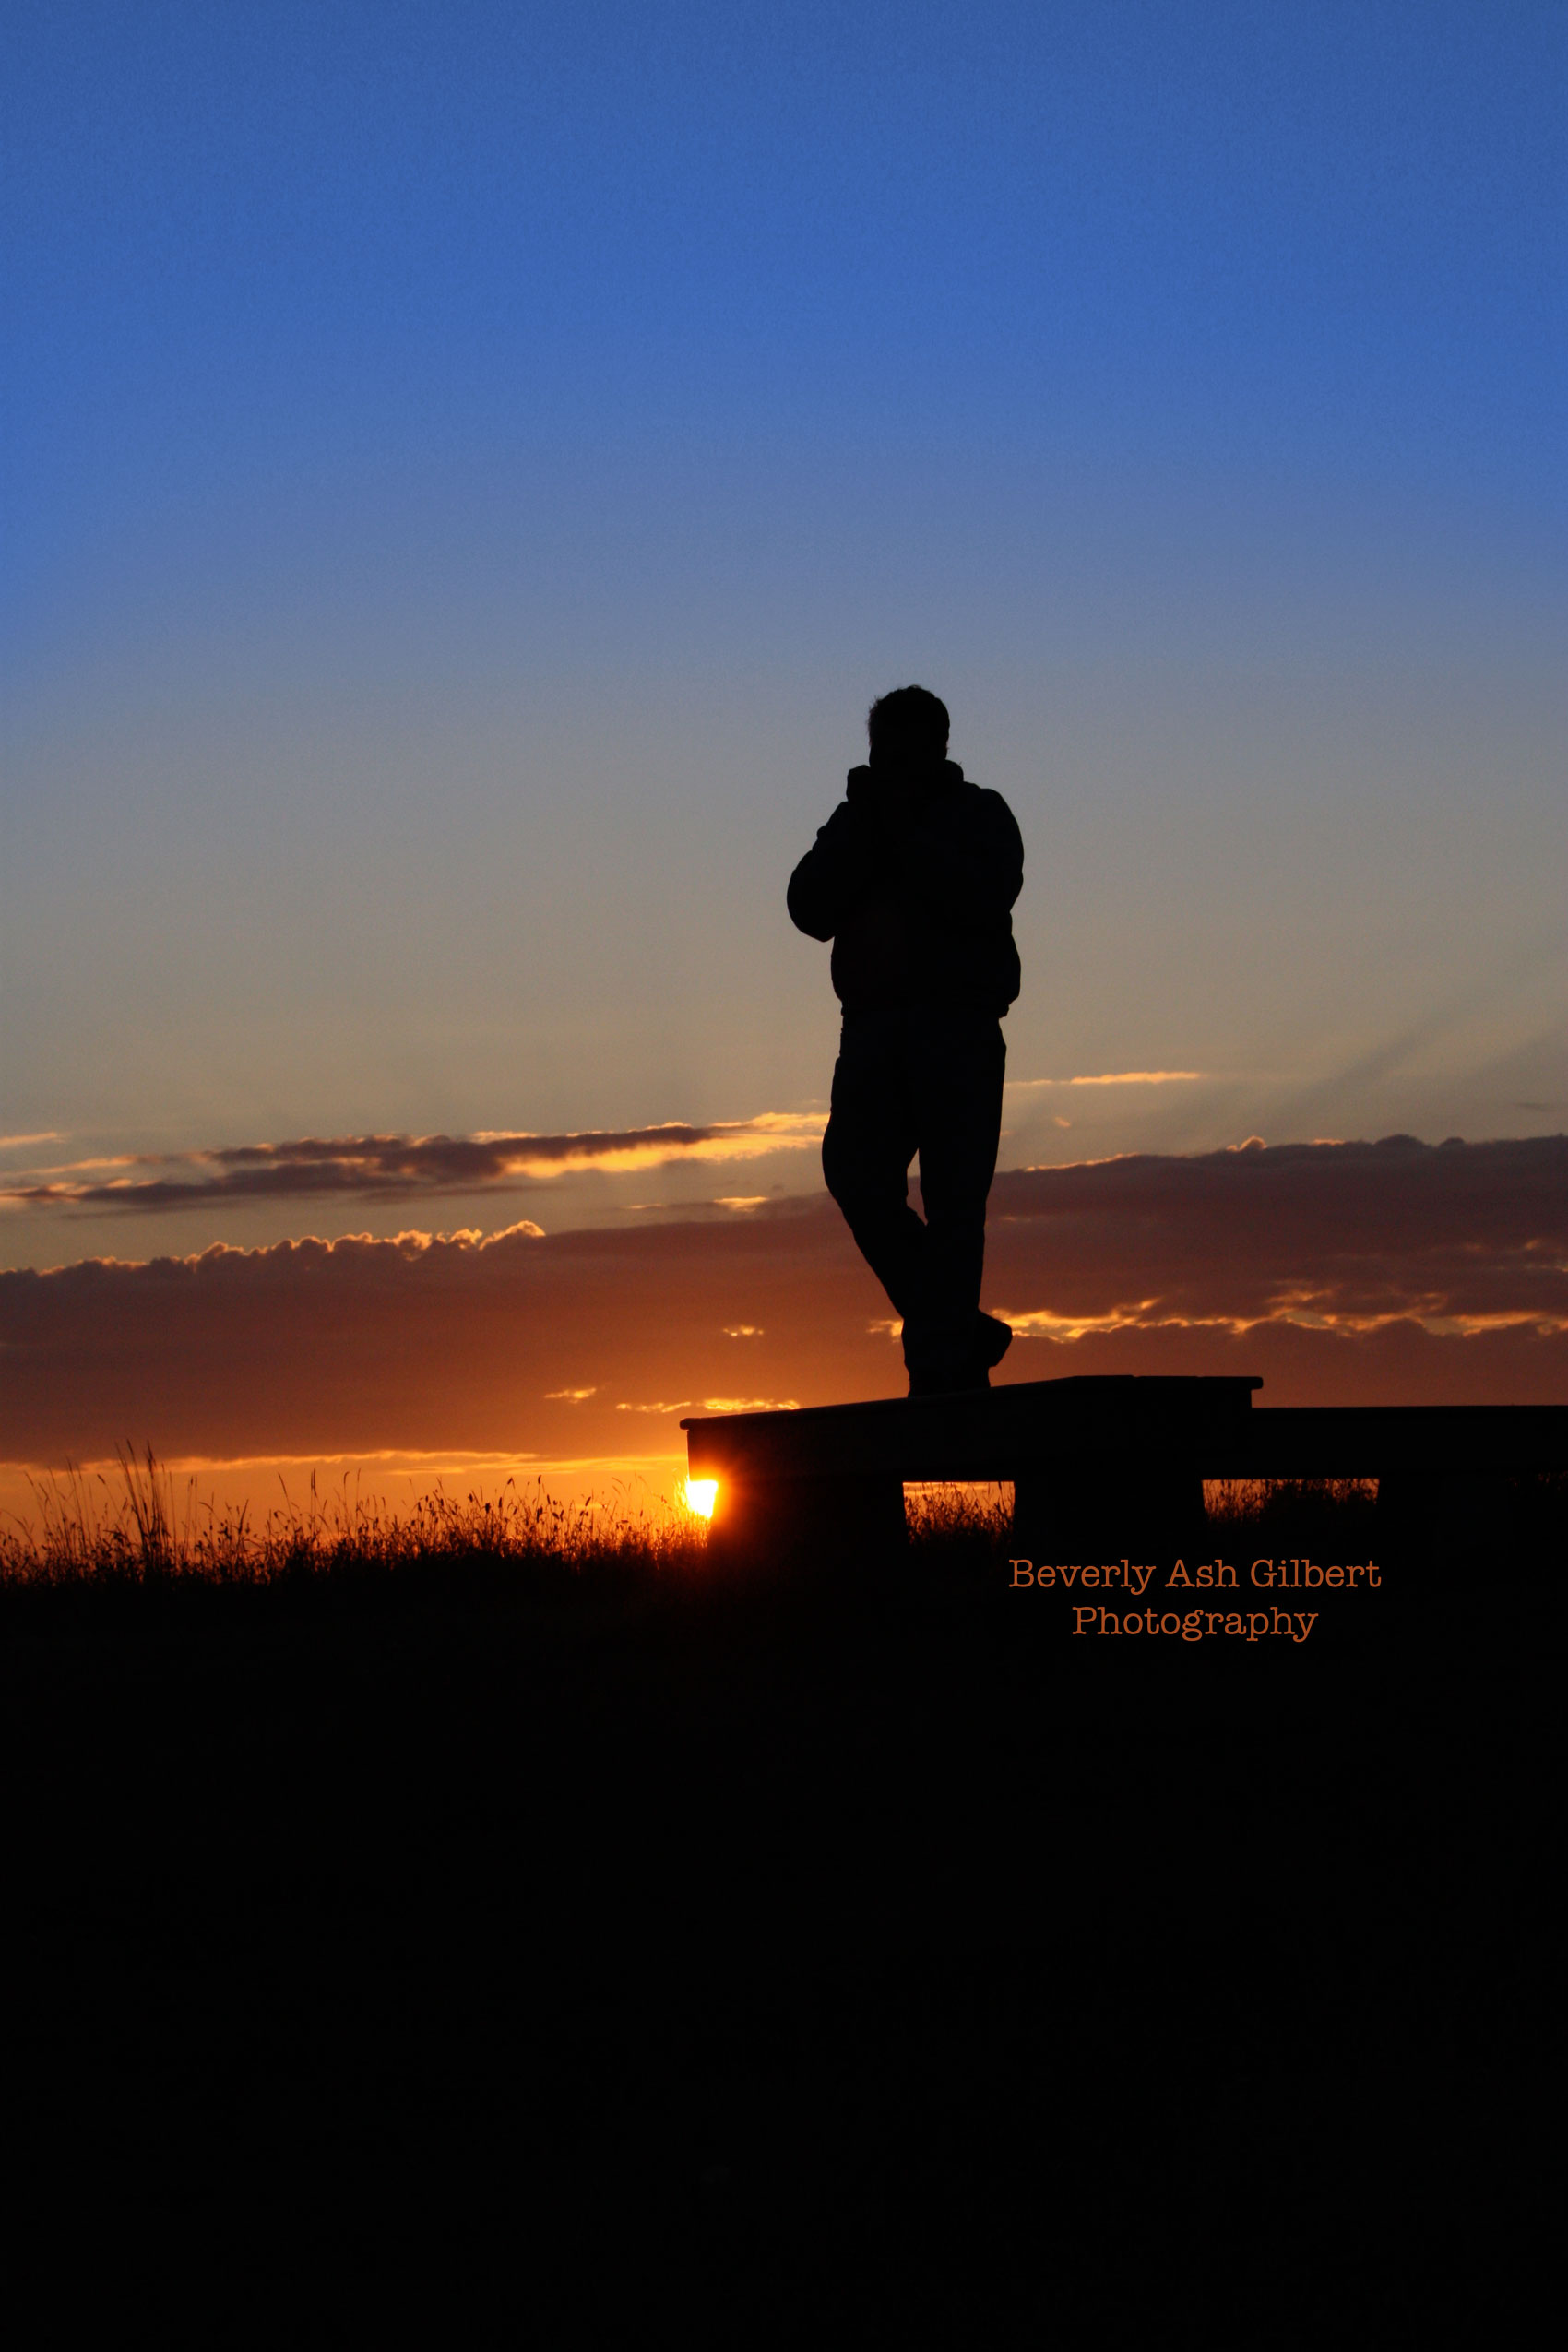 Silhouette-sunset-on-bench_adj_web.jpg